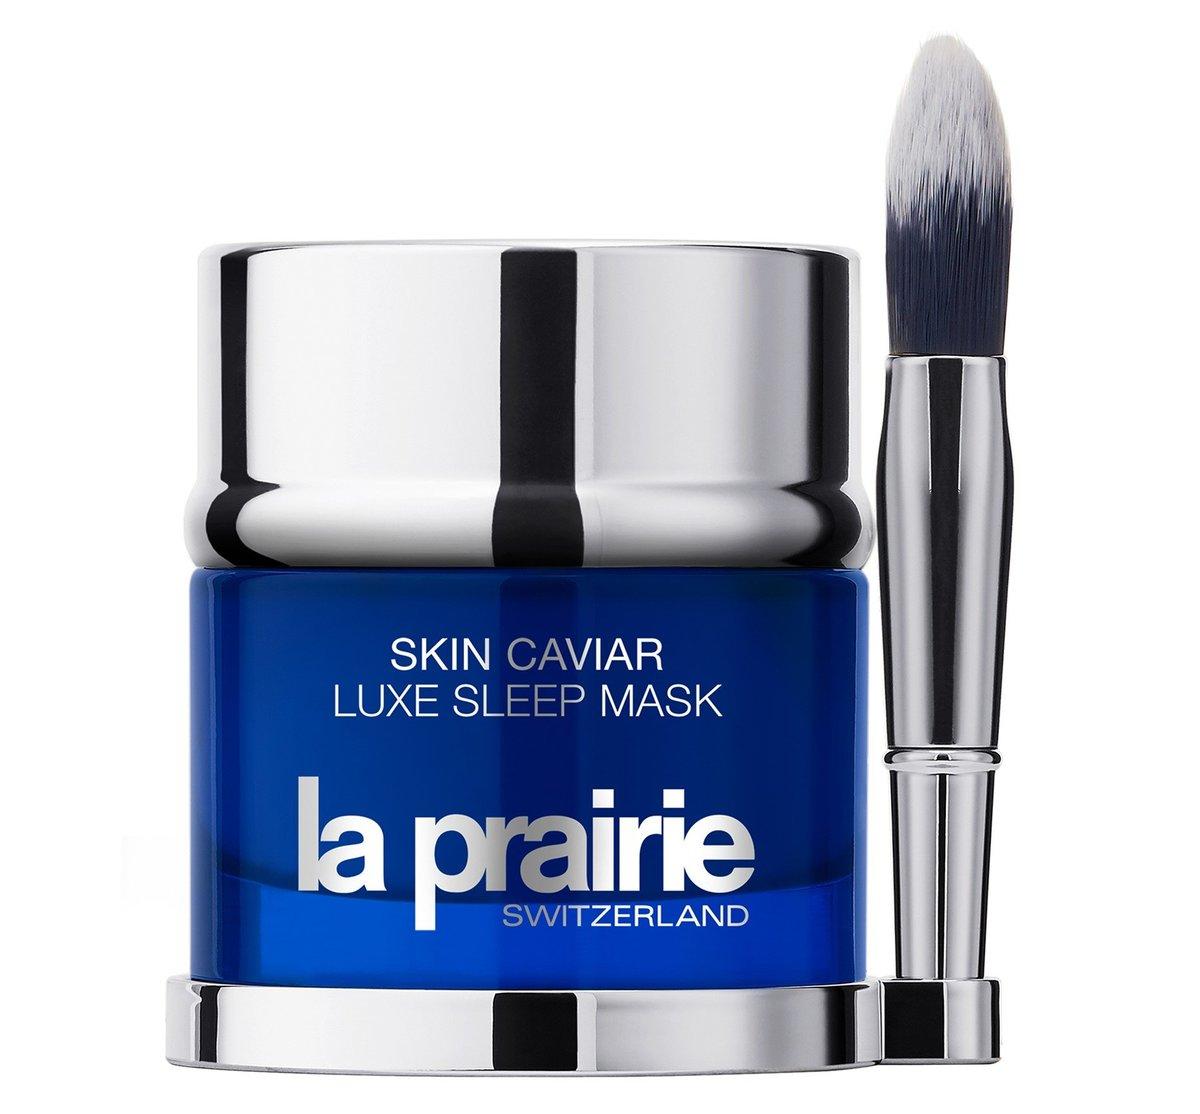 Skin Caviar Luxe Sleep Mask 50ml (Parallel Import)